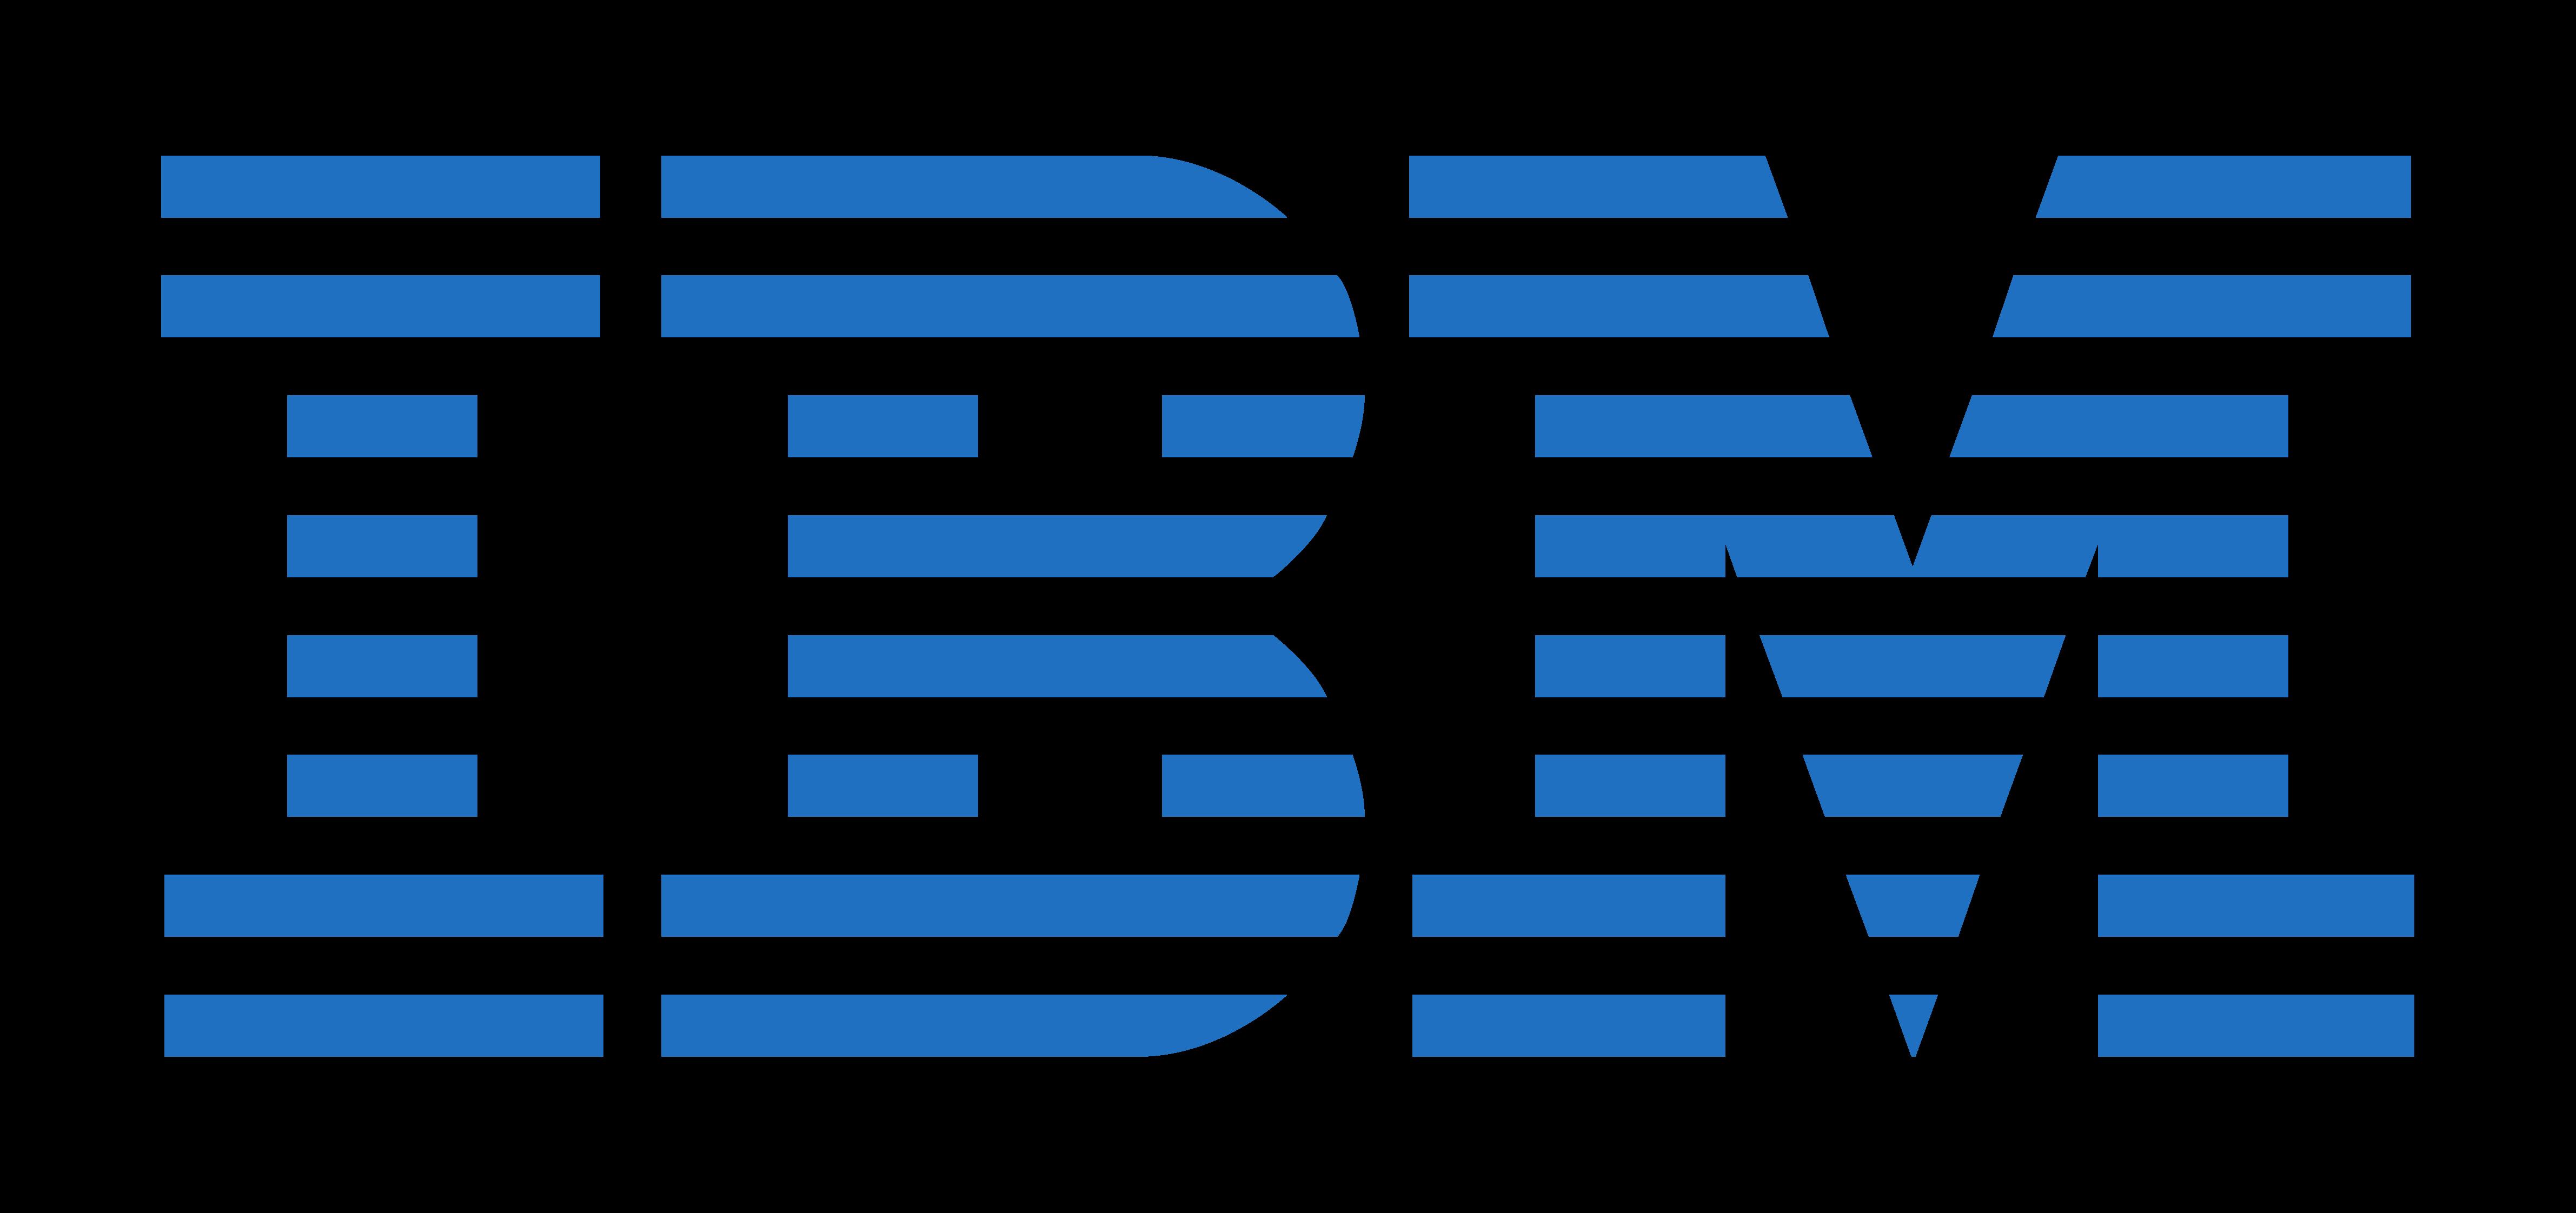 IBM_padded